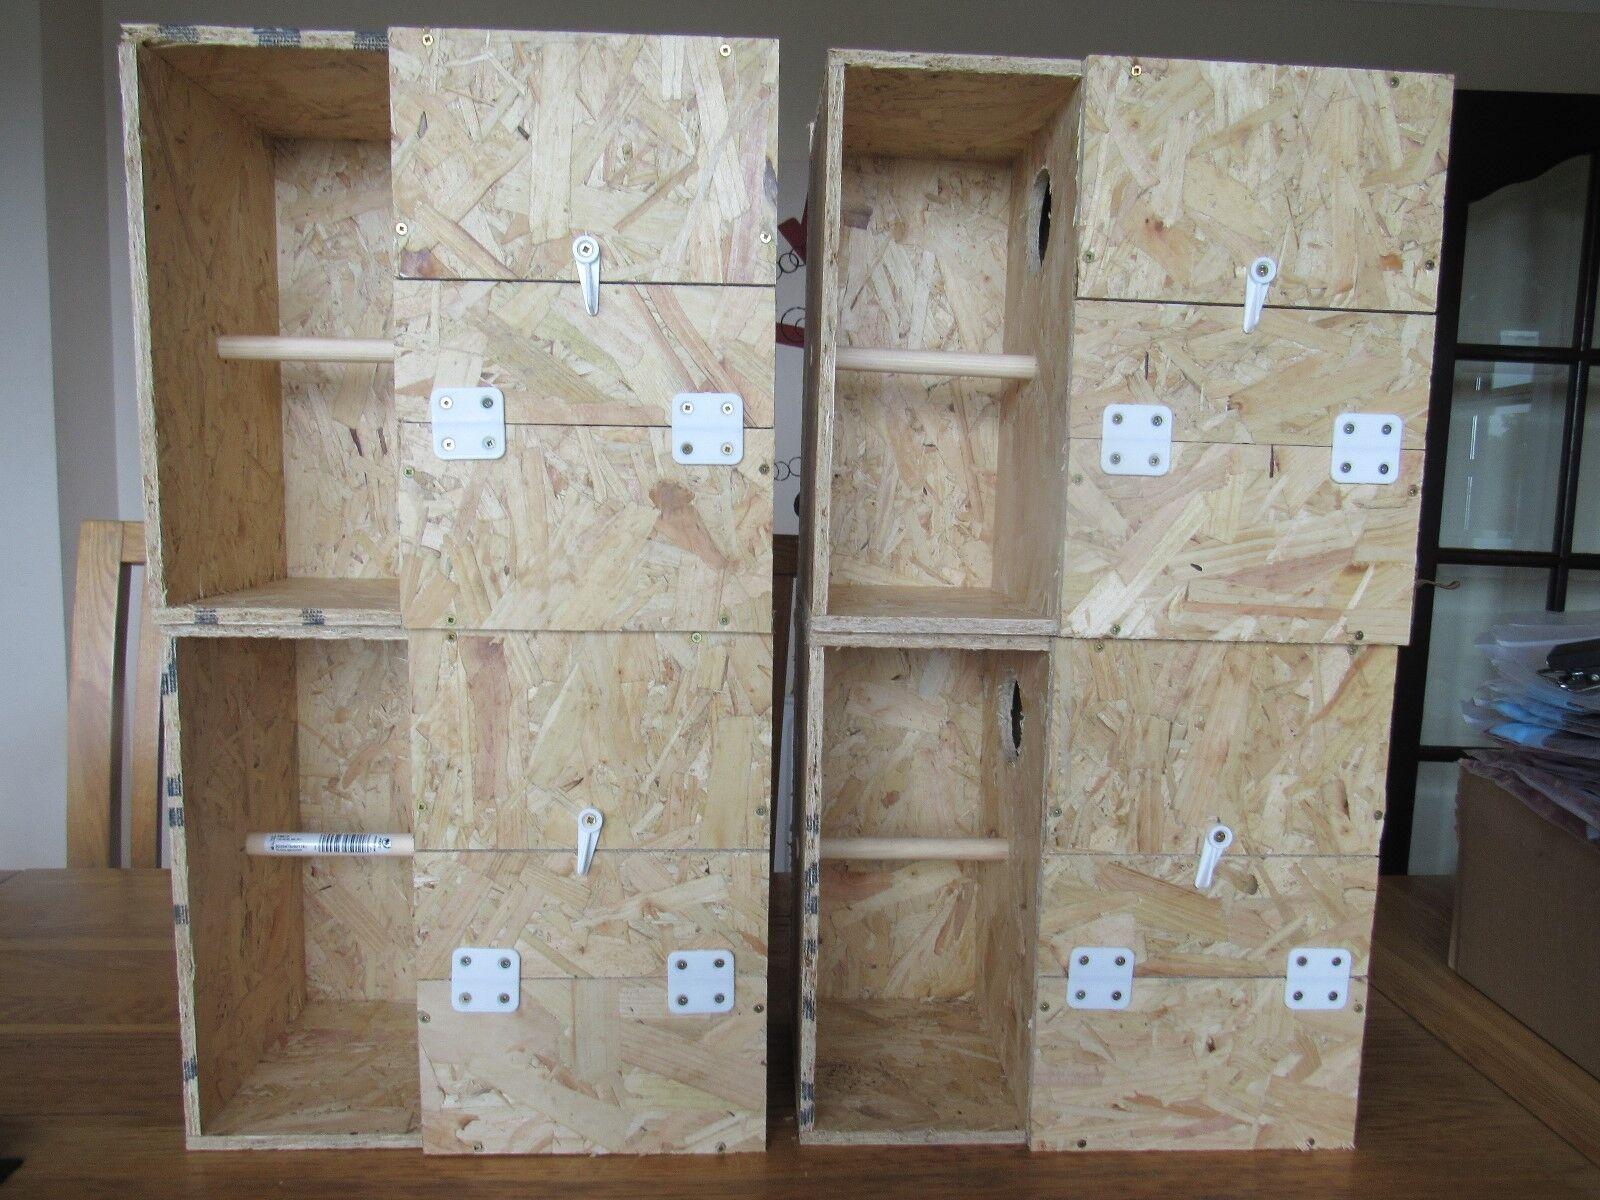 4 X KAKARIKI NEST BOXES WITH PORCH CRECHE FOR BREEDING 8 X8 X13    13.5 X13 X8